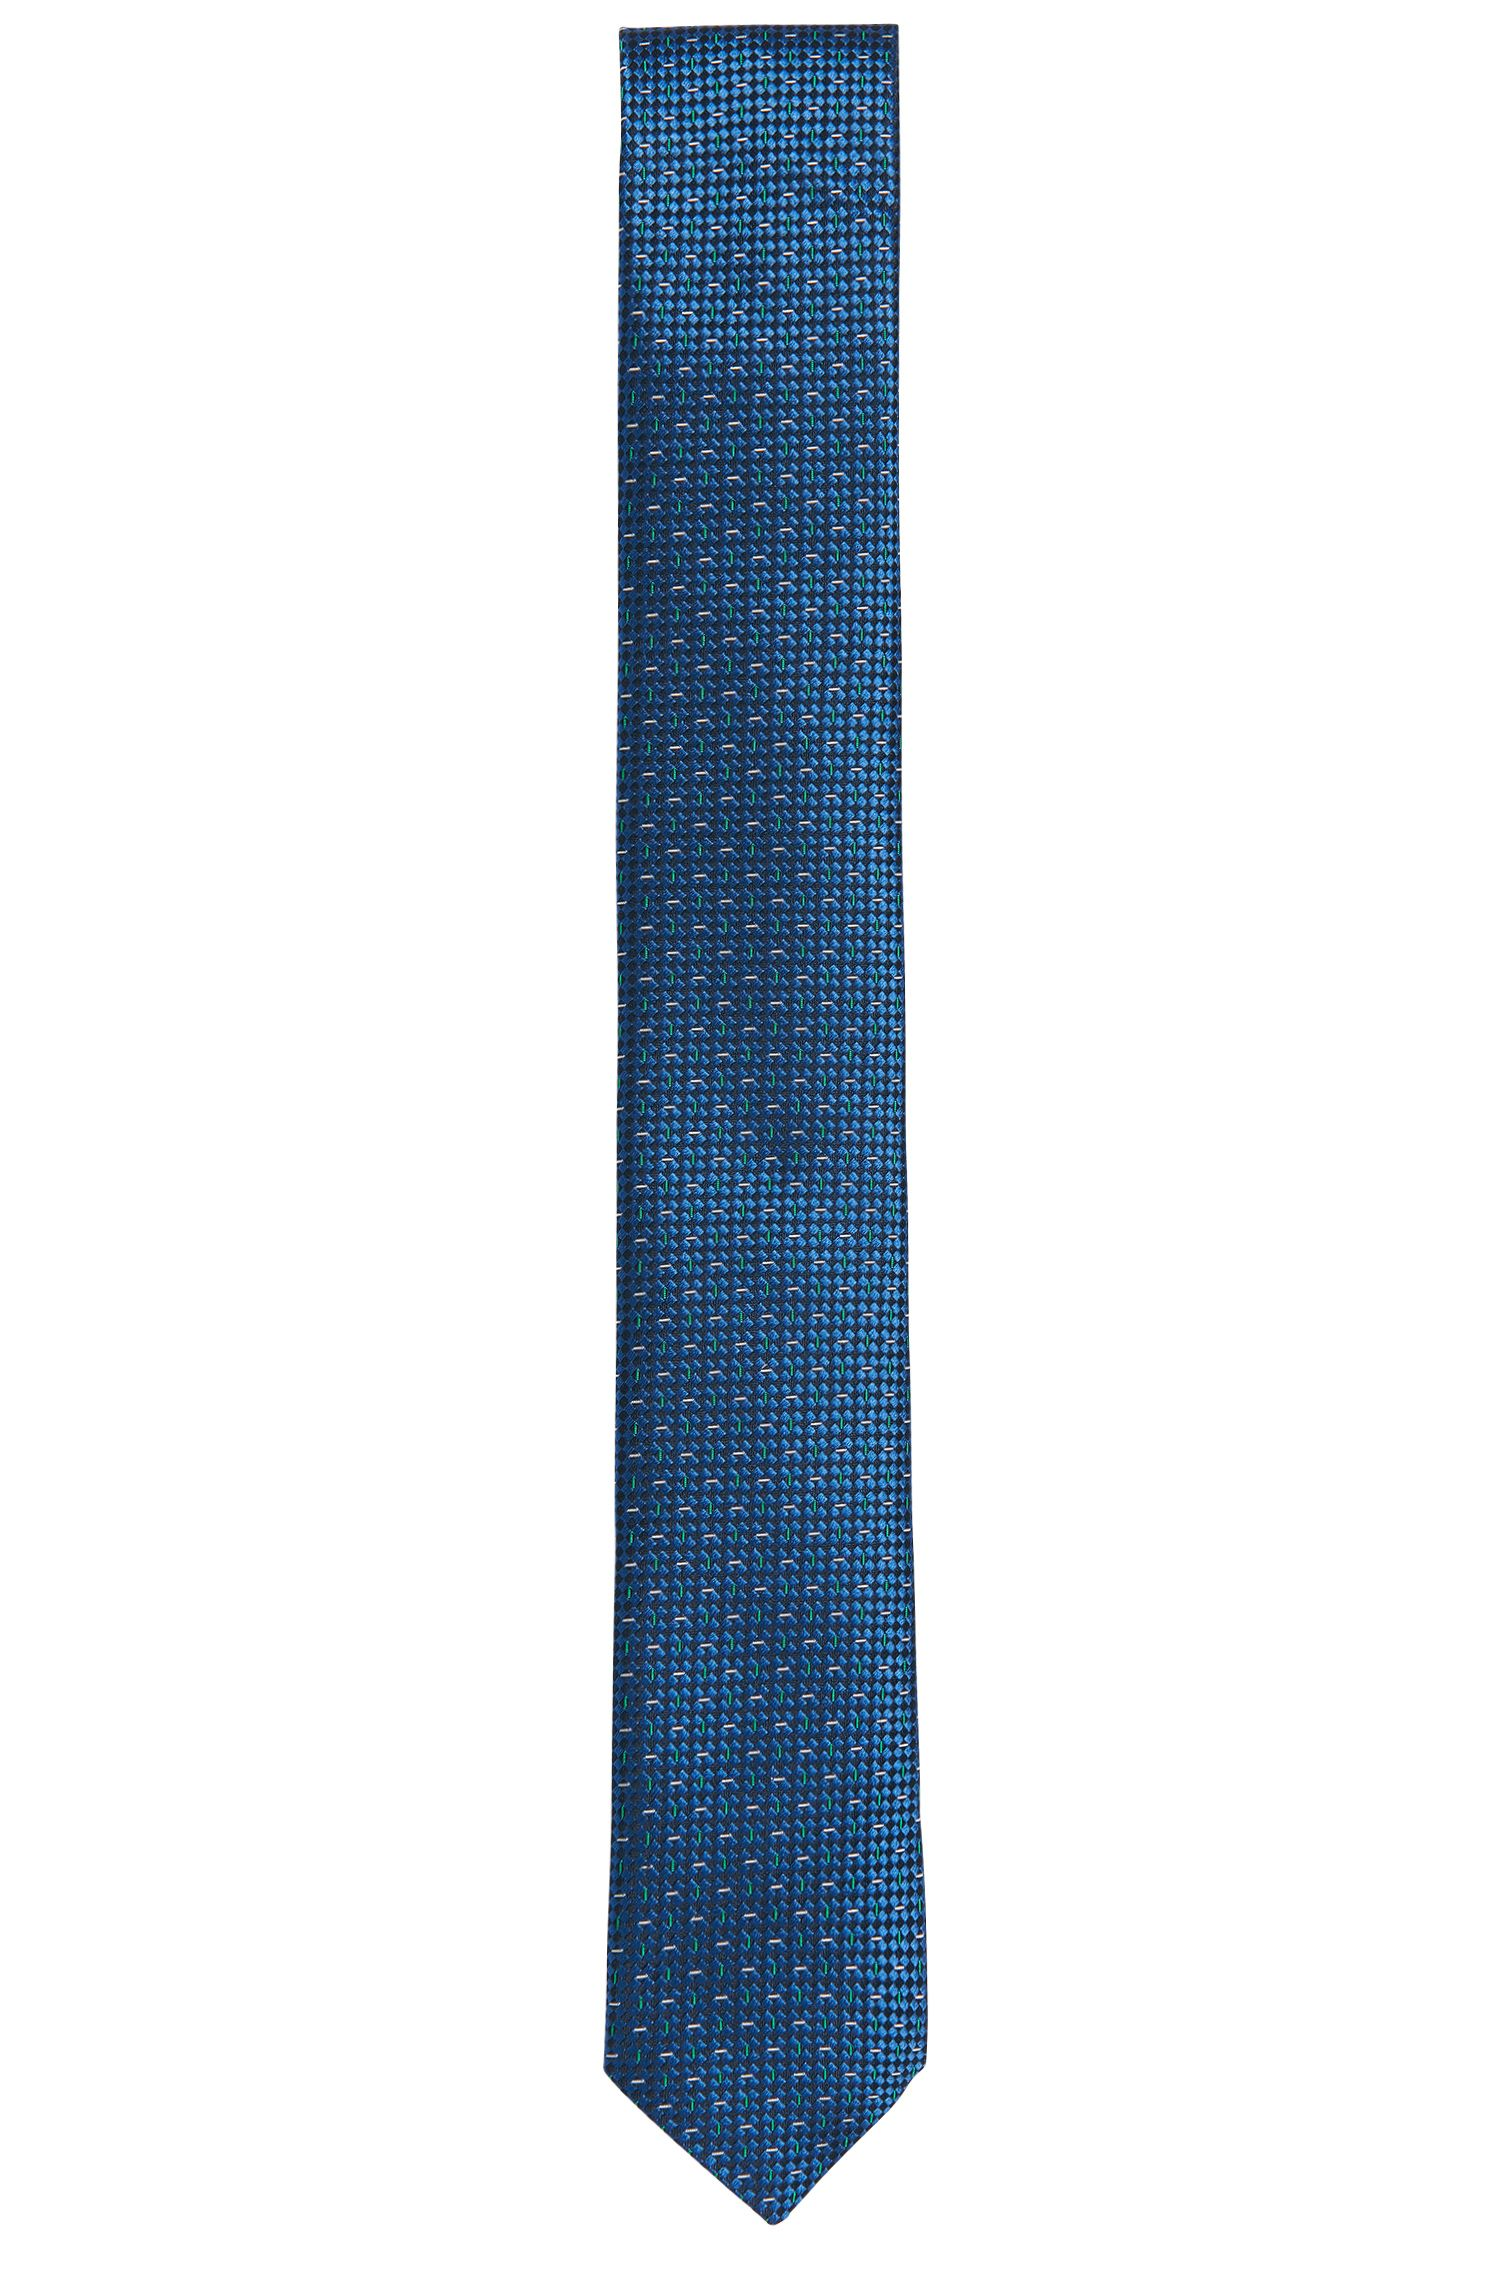 Corbata de seda con textura fina: 'Tie 6cm'